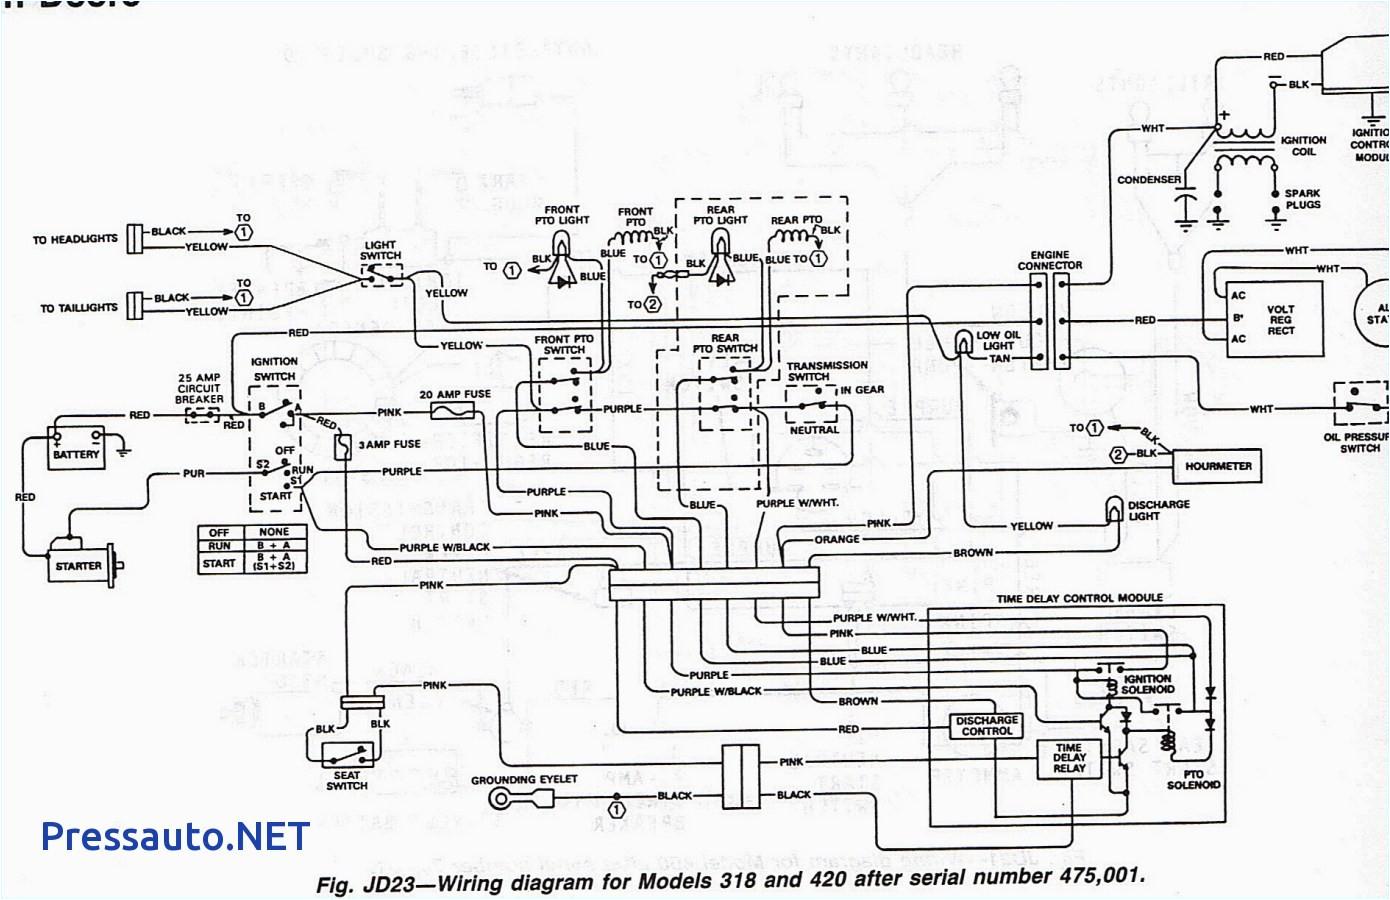 f932 wiring diagram wiring diagramjohn deere 655 wiring diagram blog wiring diagramstx46 wiring diagram wiring diagram